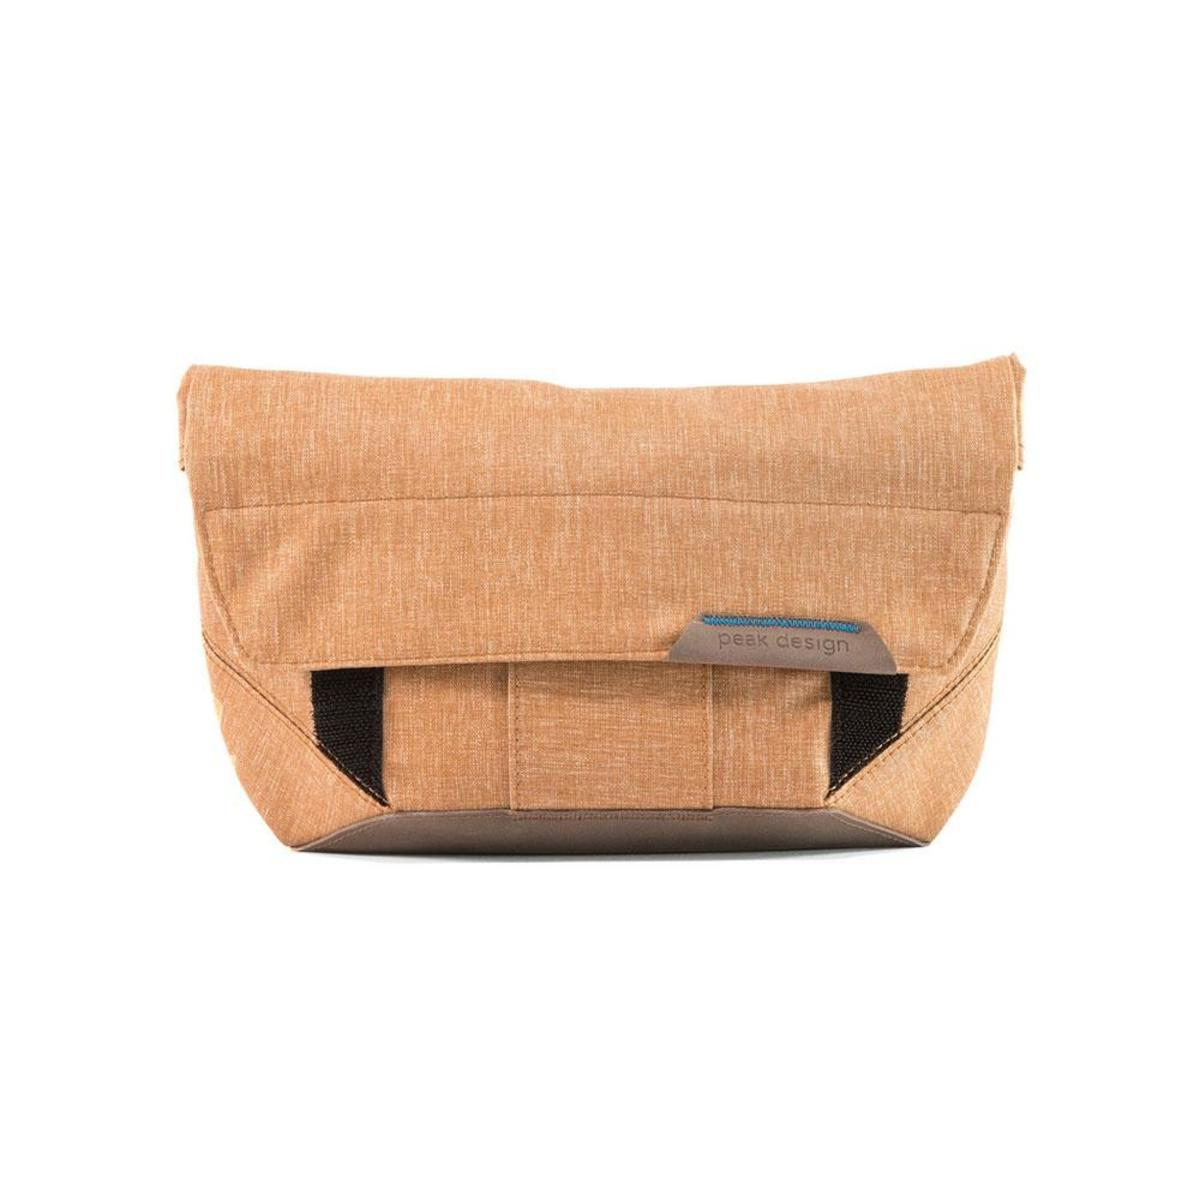 Field Pouch Multi Function 3L Handheld Bag sling Bag BP-BR-1 (Tan)